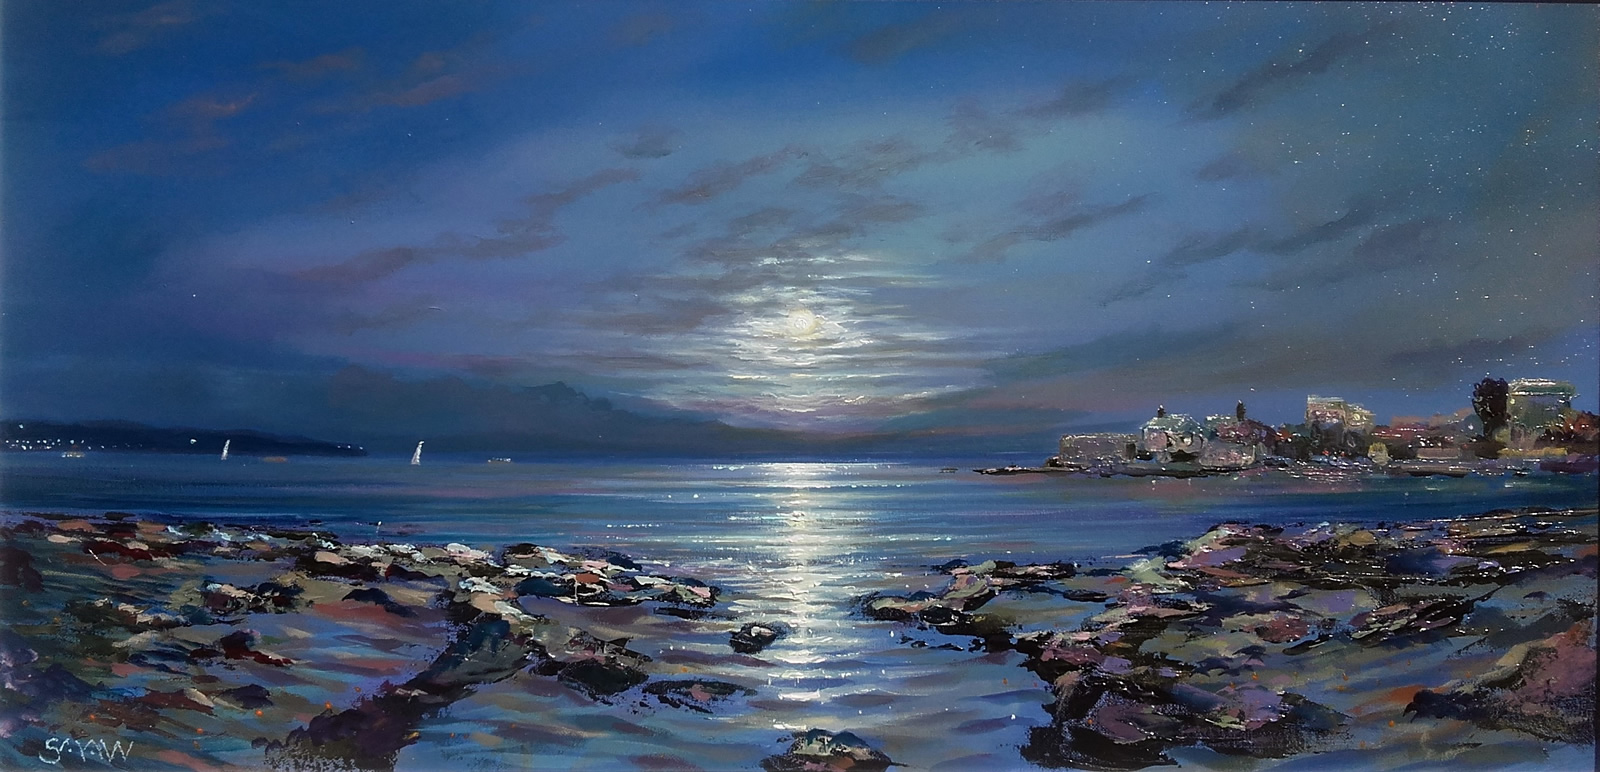 Sandycove Moon - Robert Shaw